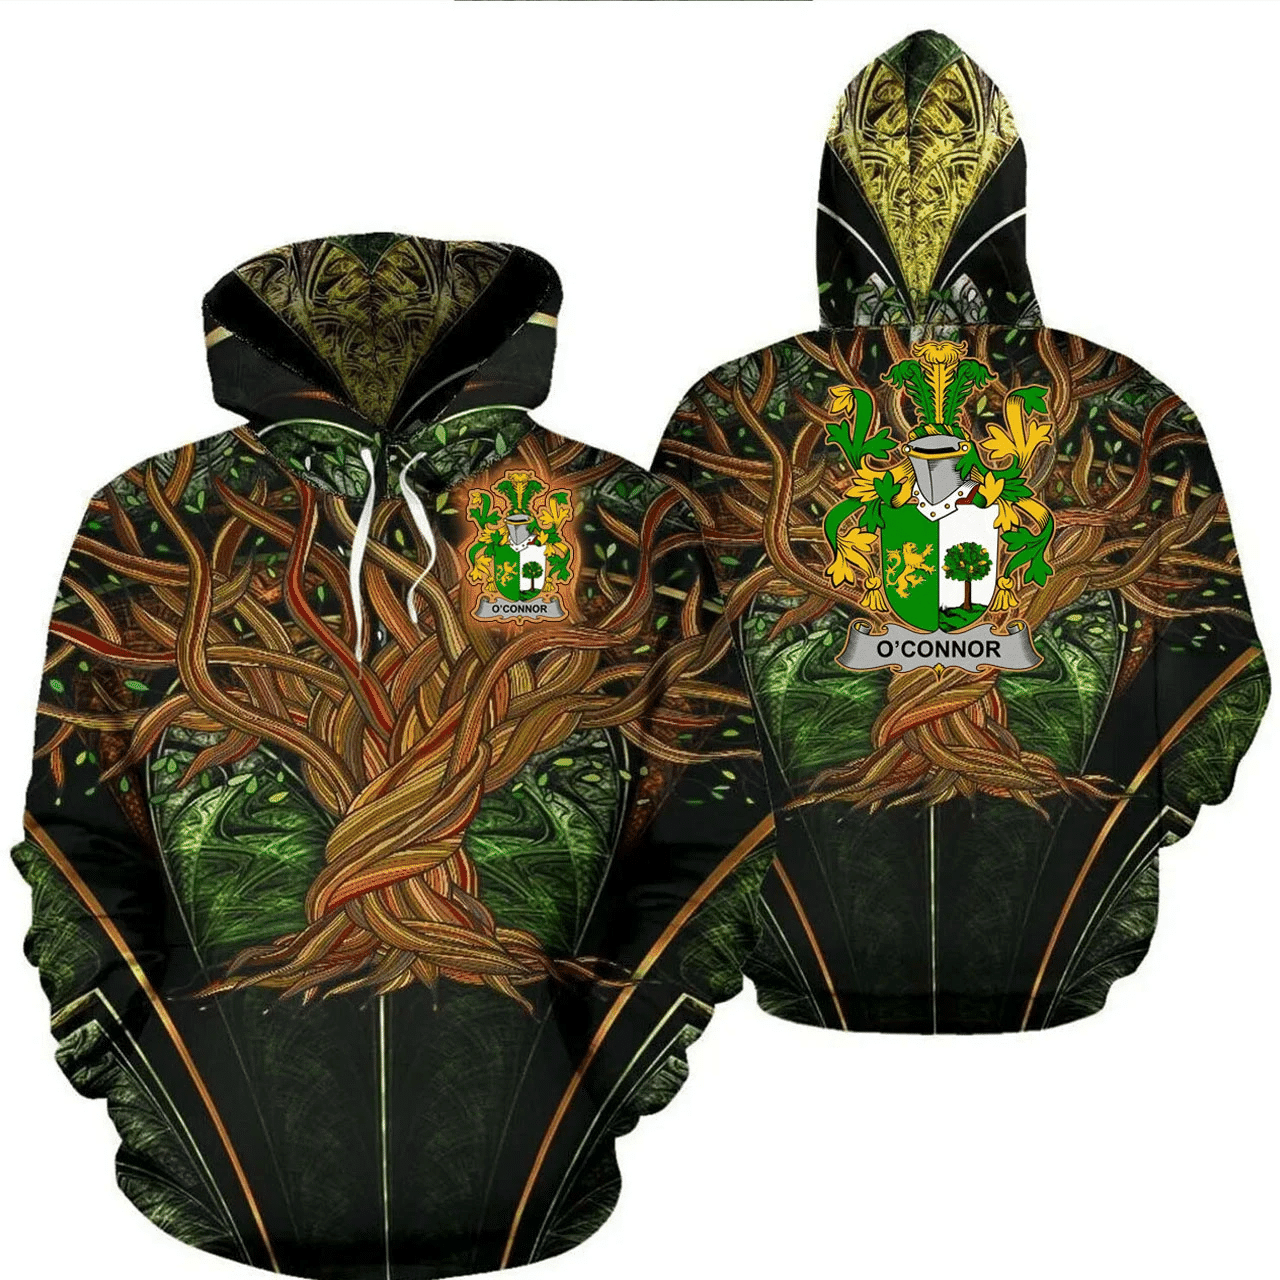 1stIreland Ireland Hoodie - Connor or O'Connor (Sligo) Irish Family Crest Hoodie - Tree Of Life A7